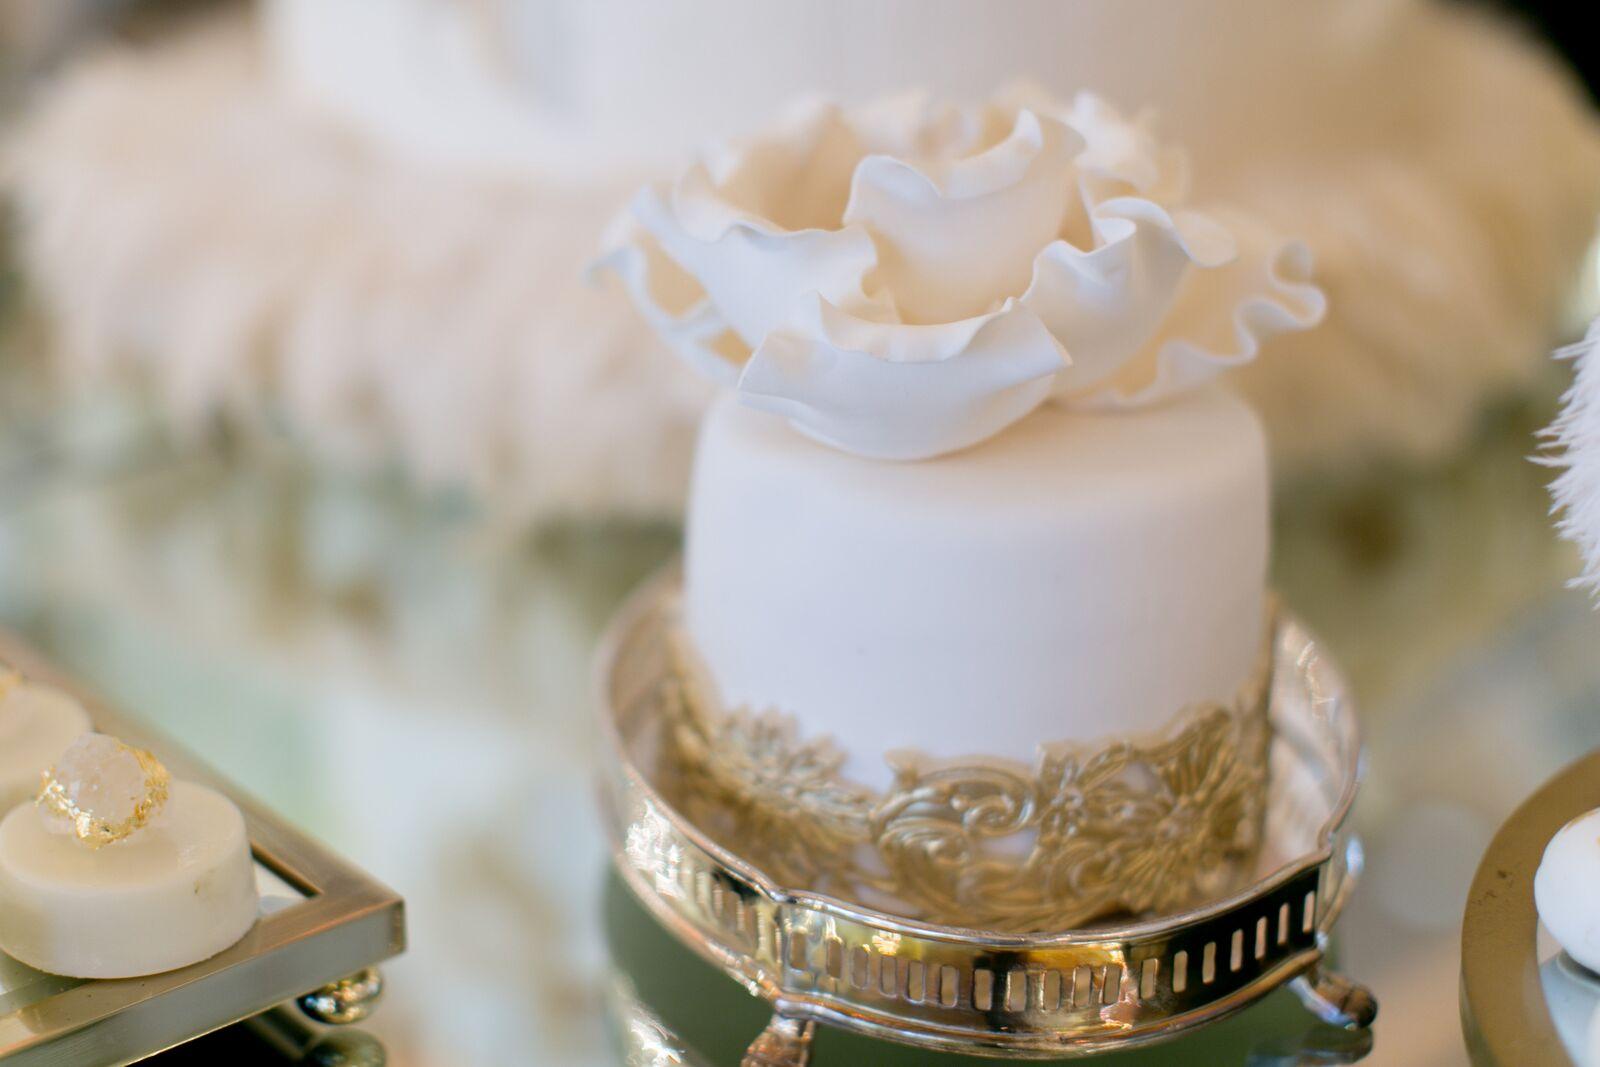 STUNNING CASA DEL MAR WEDDING - Revelry Event Designers